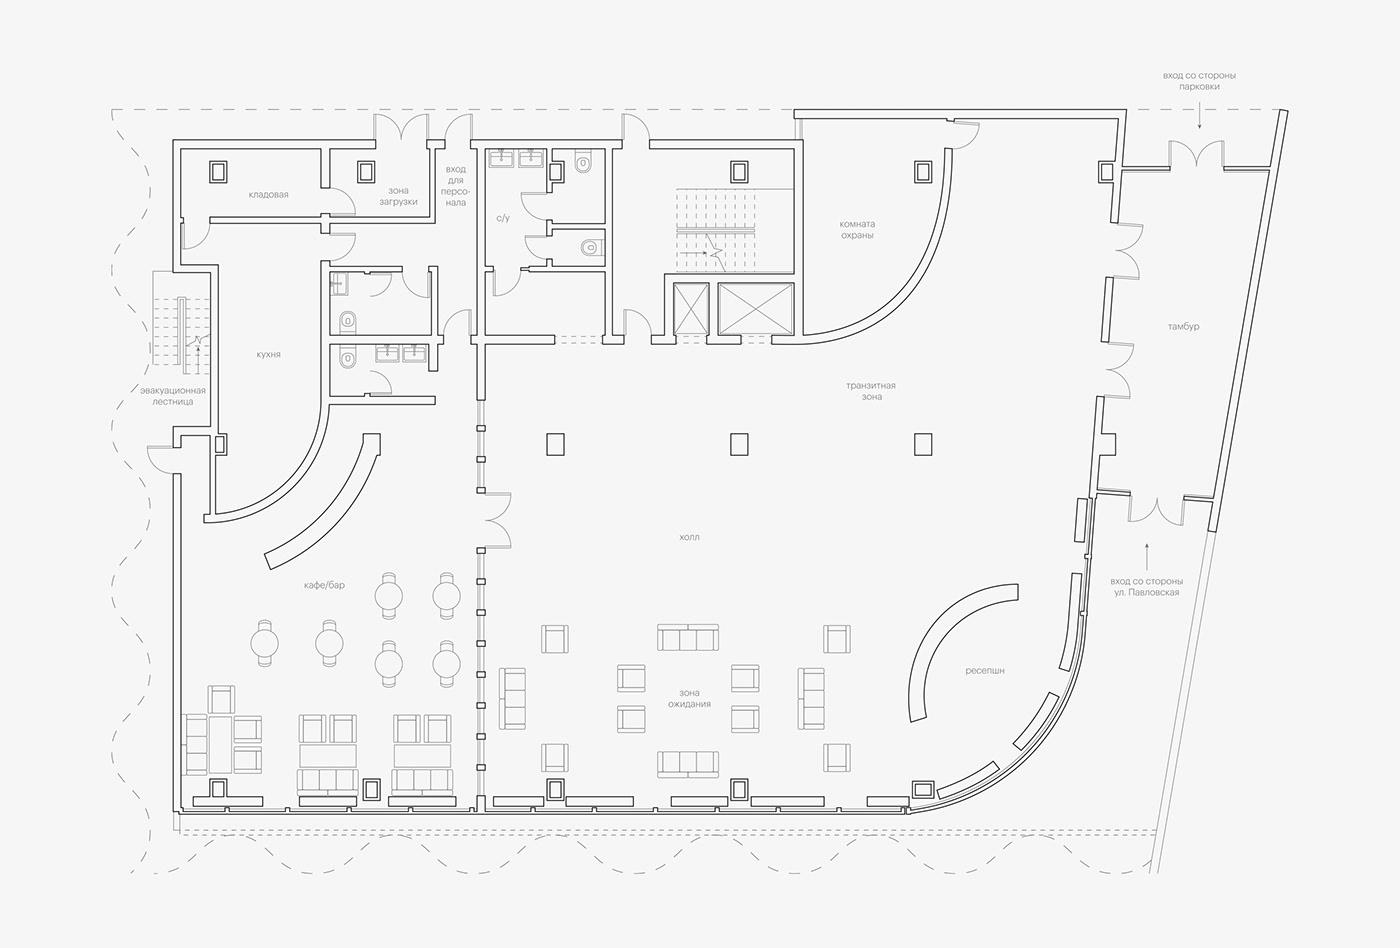 3D Visualization architecture concept архитектура концепция реконструкция